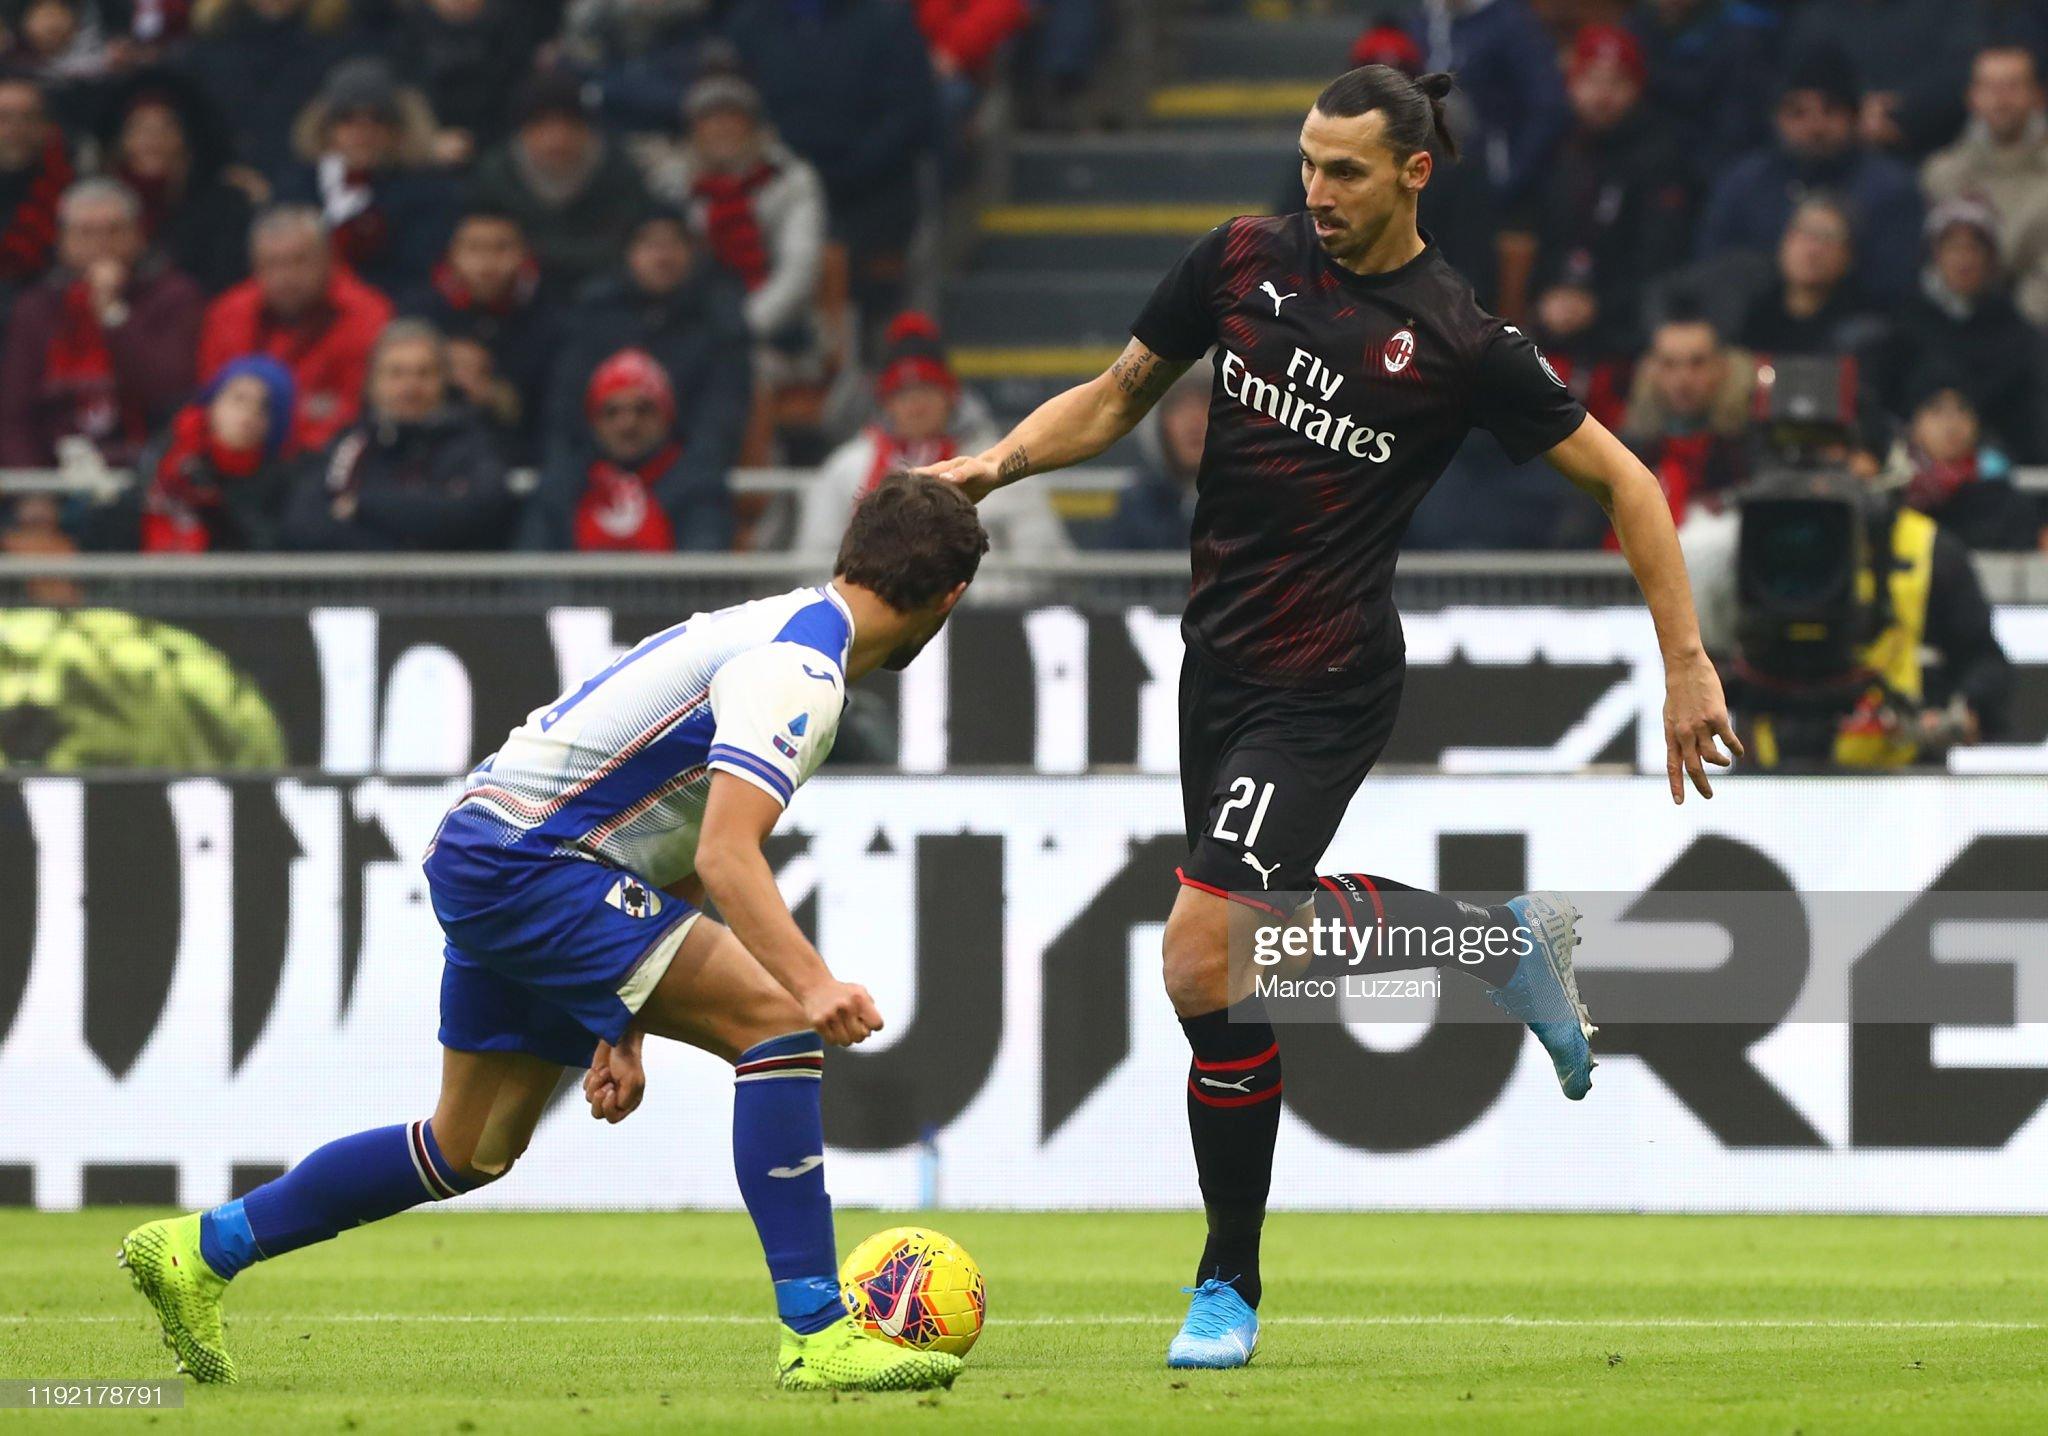 Sampdoria vs AC Milan Preview, prediction and odds